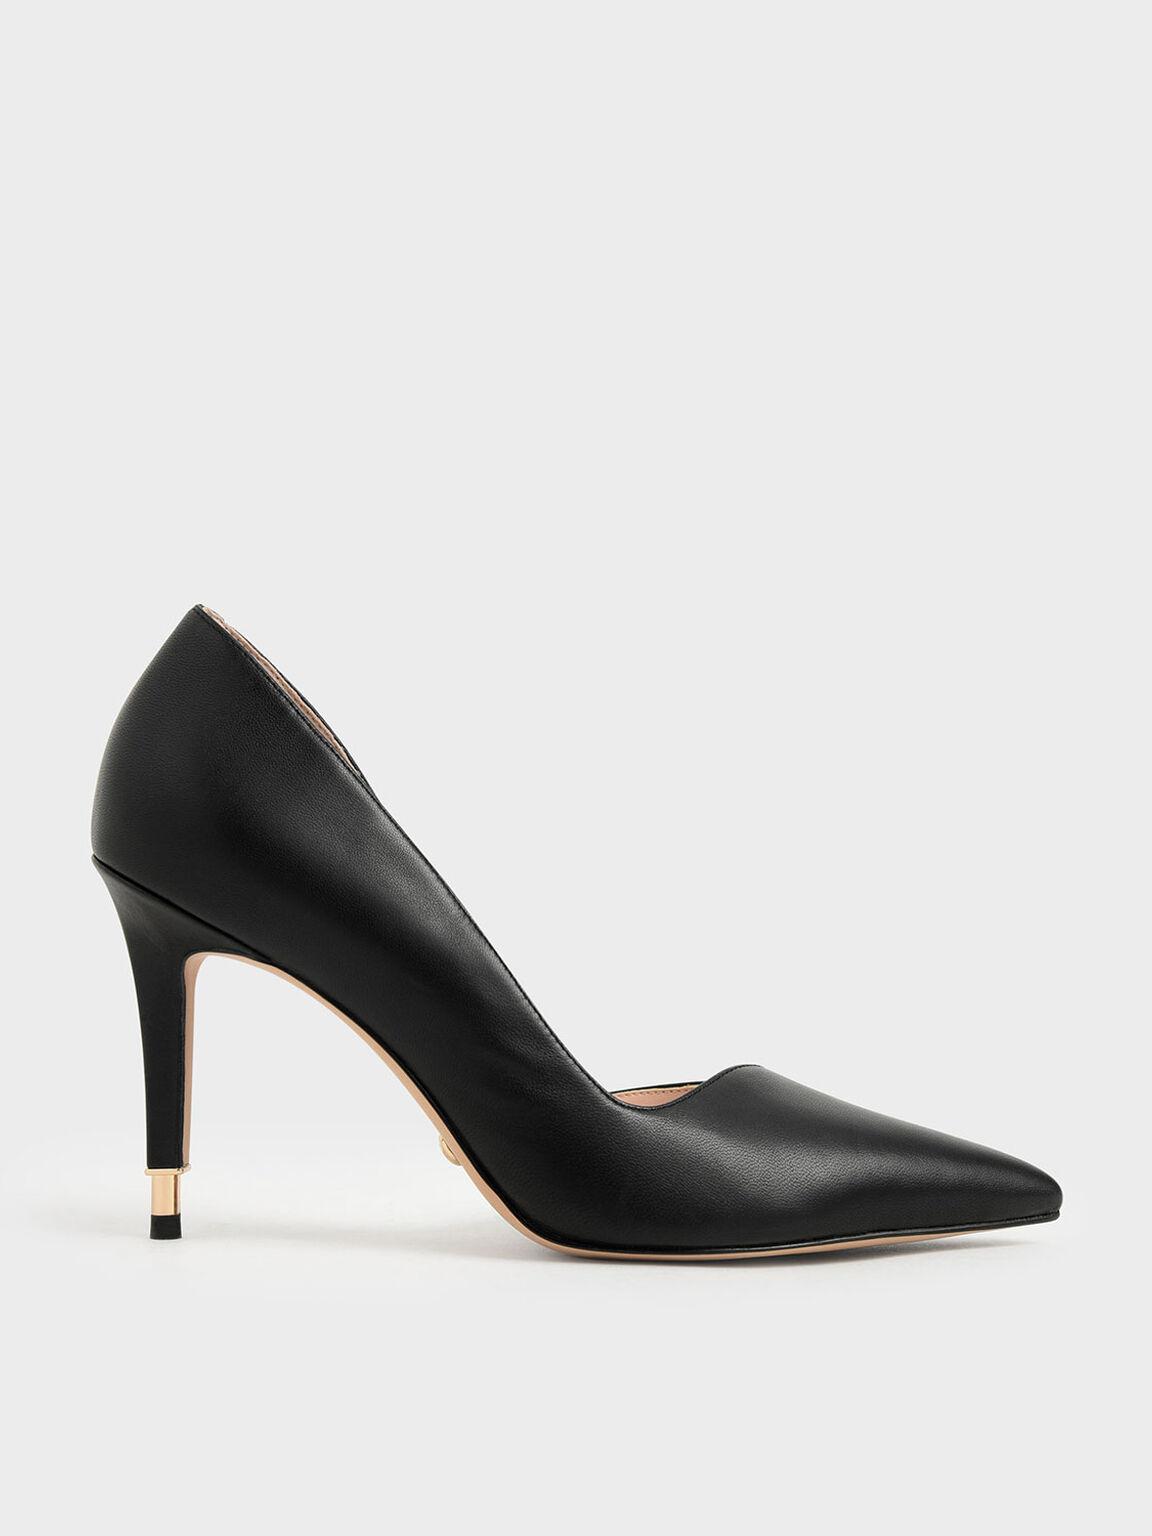 Leather D'Orsay Pumps, Black, hi-res